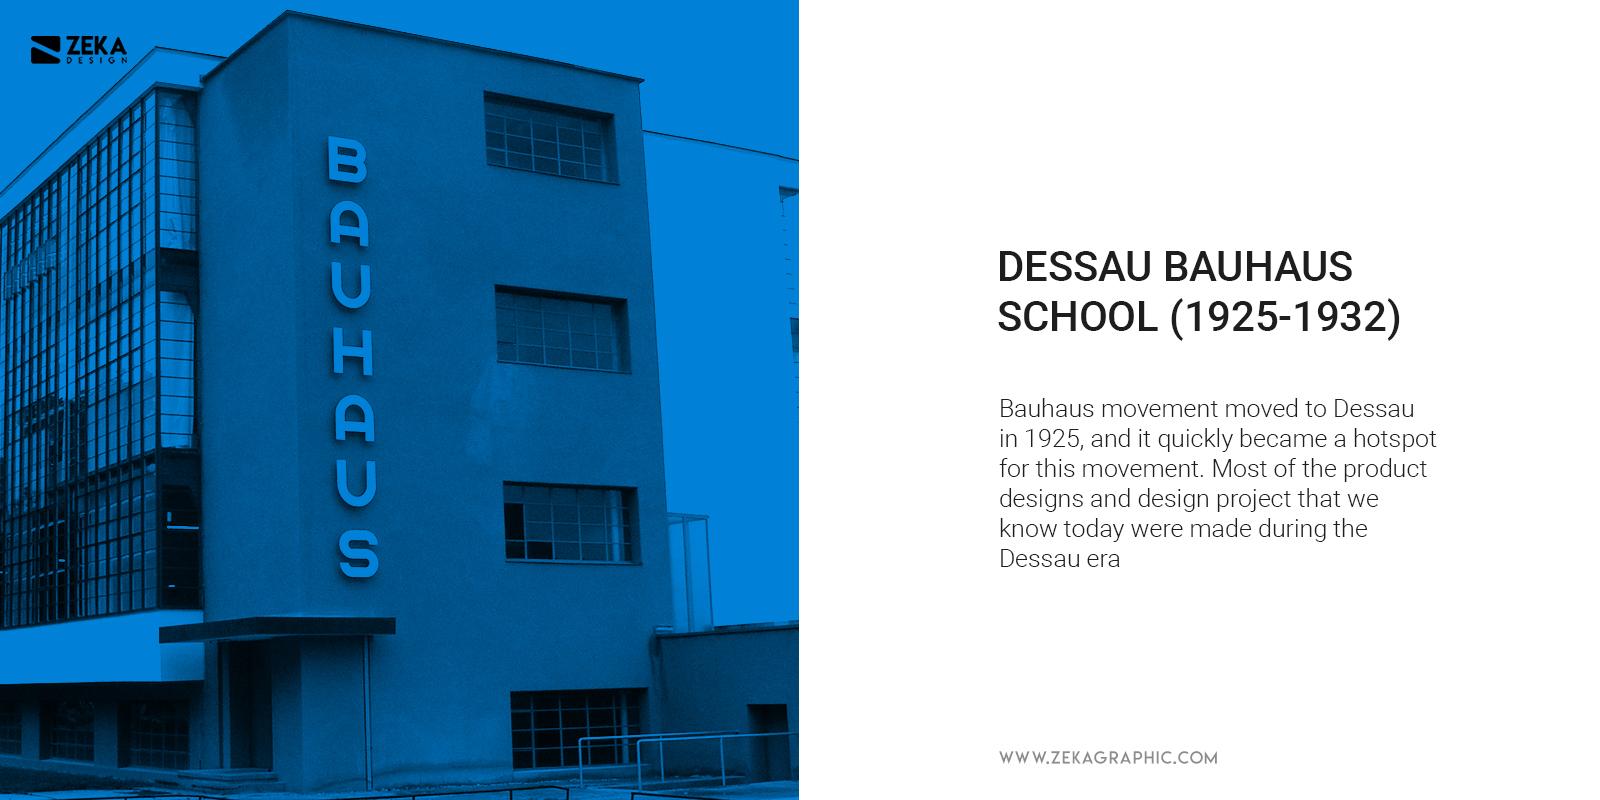 Dessau Bauhaus School Design History